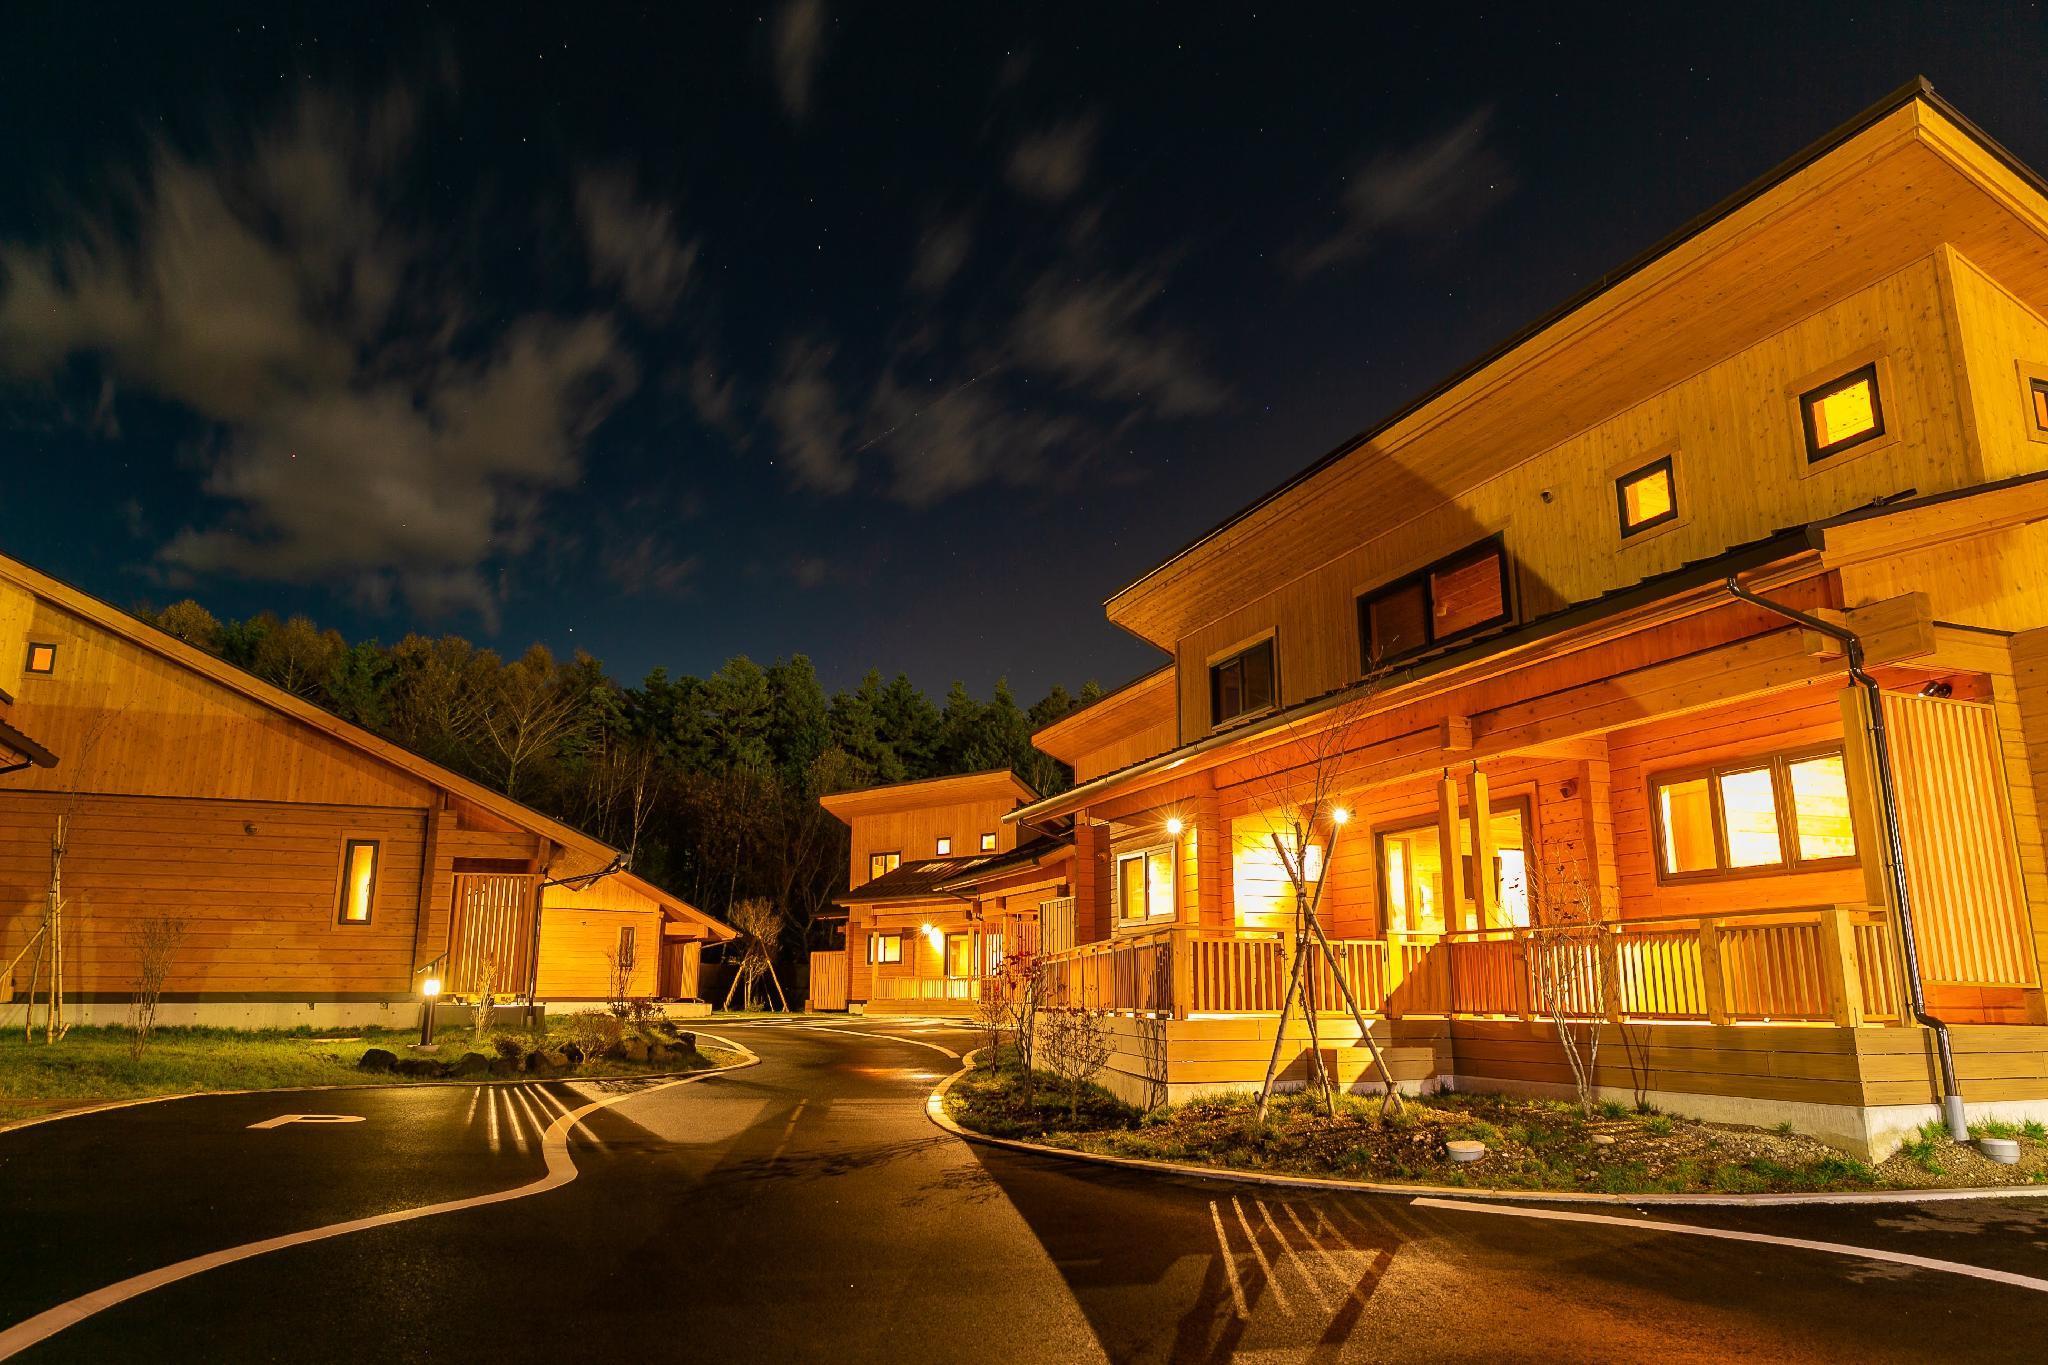 Fujisan Resort Loghouse Fuyo no yado